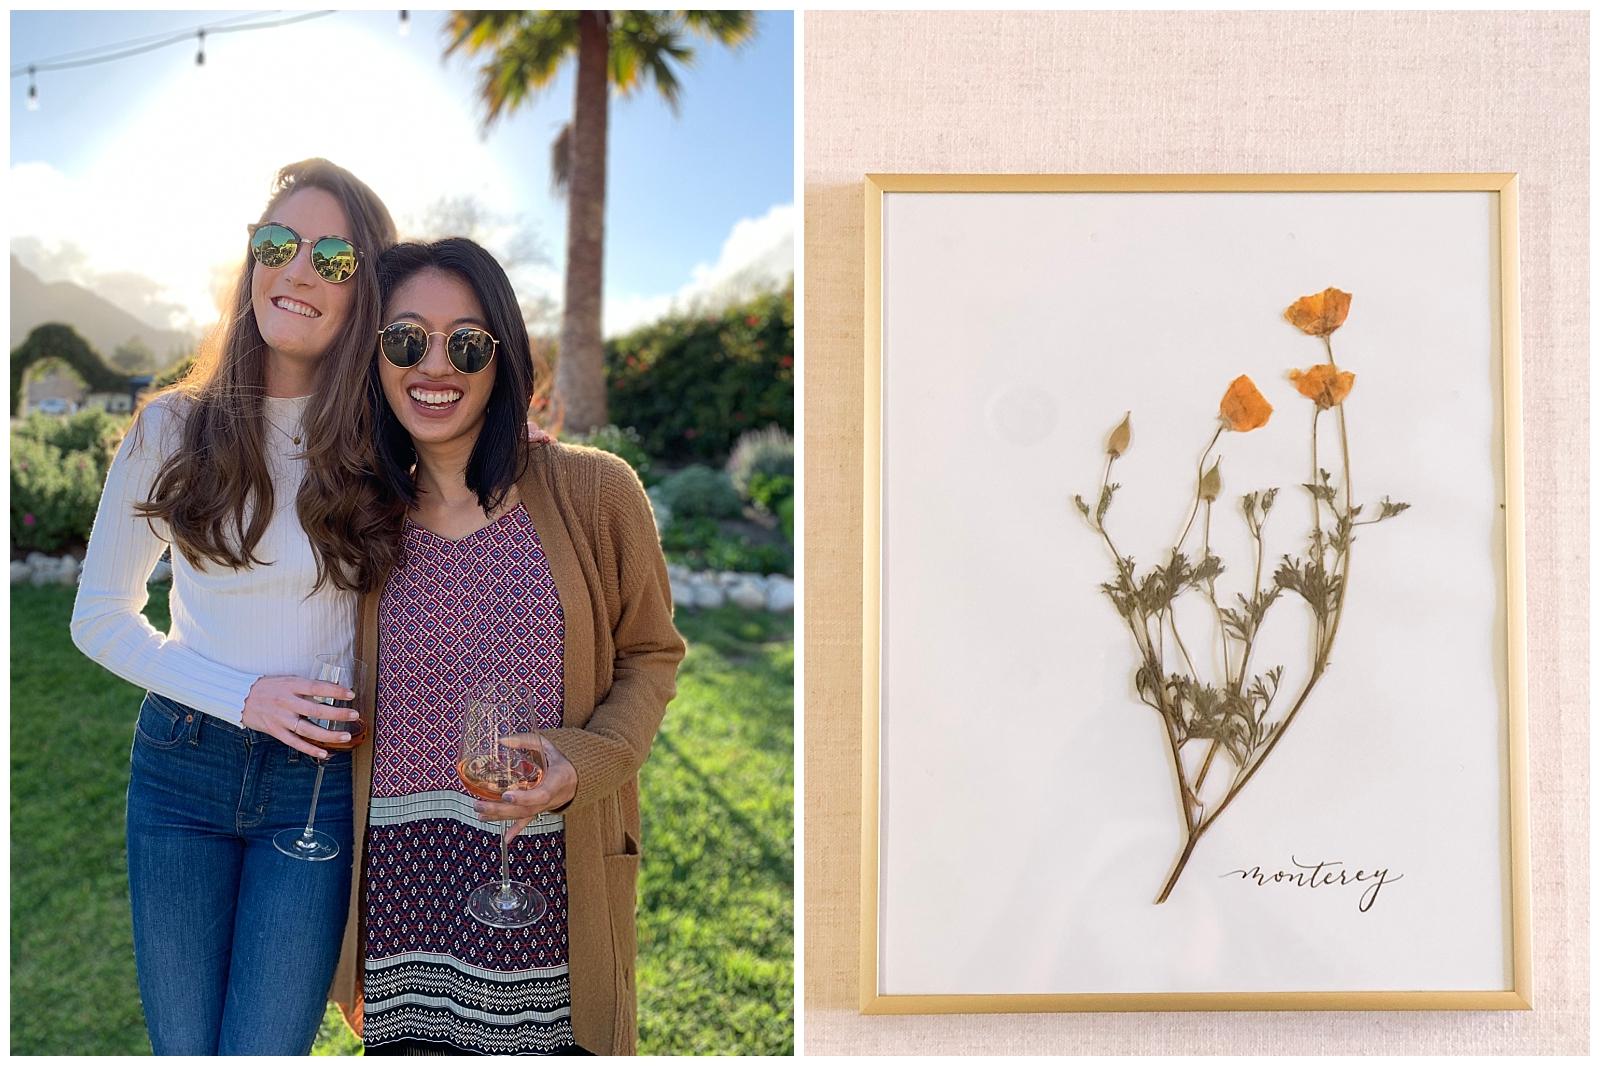 Emily-Werk-Kristine-Farnum-Pressed-Blooms-Phoenix-Feathers-Calligraphy